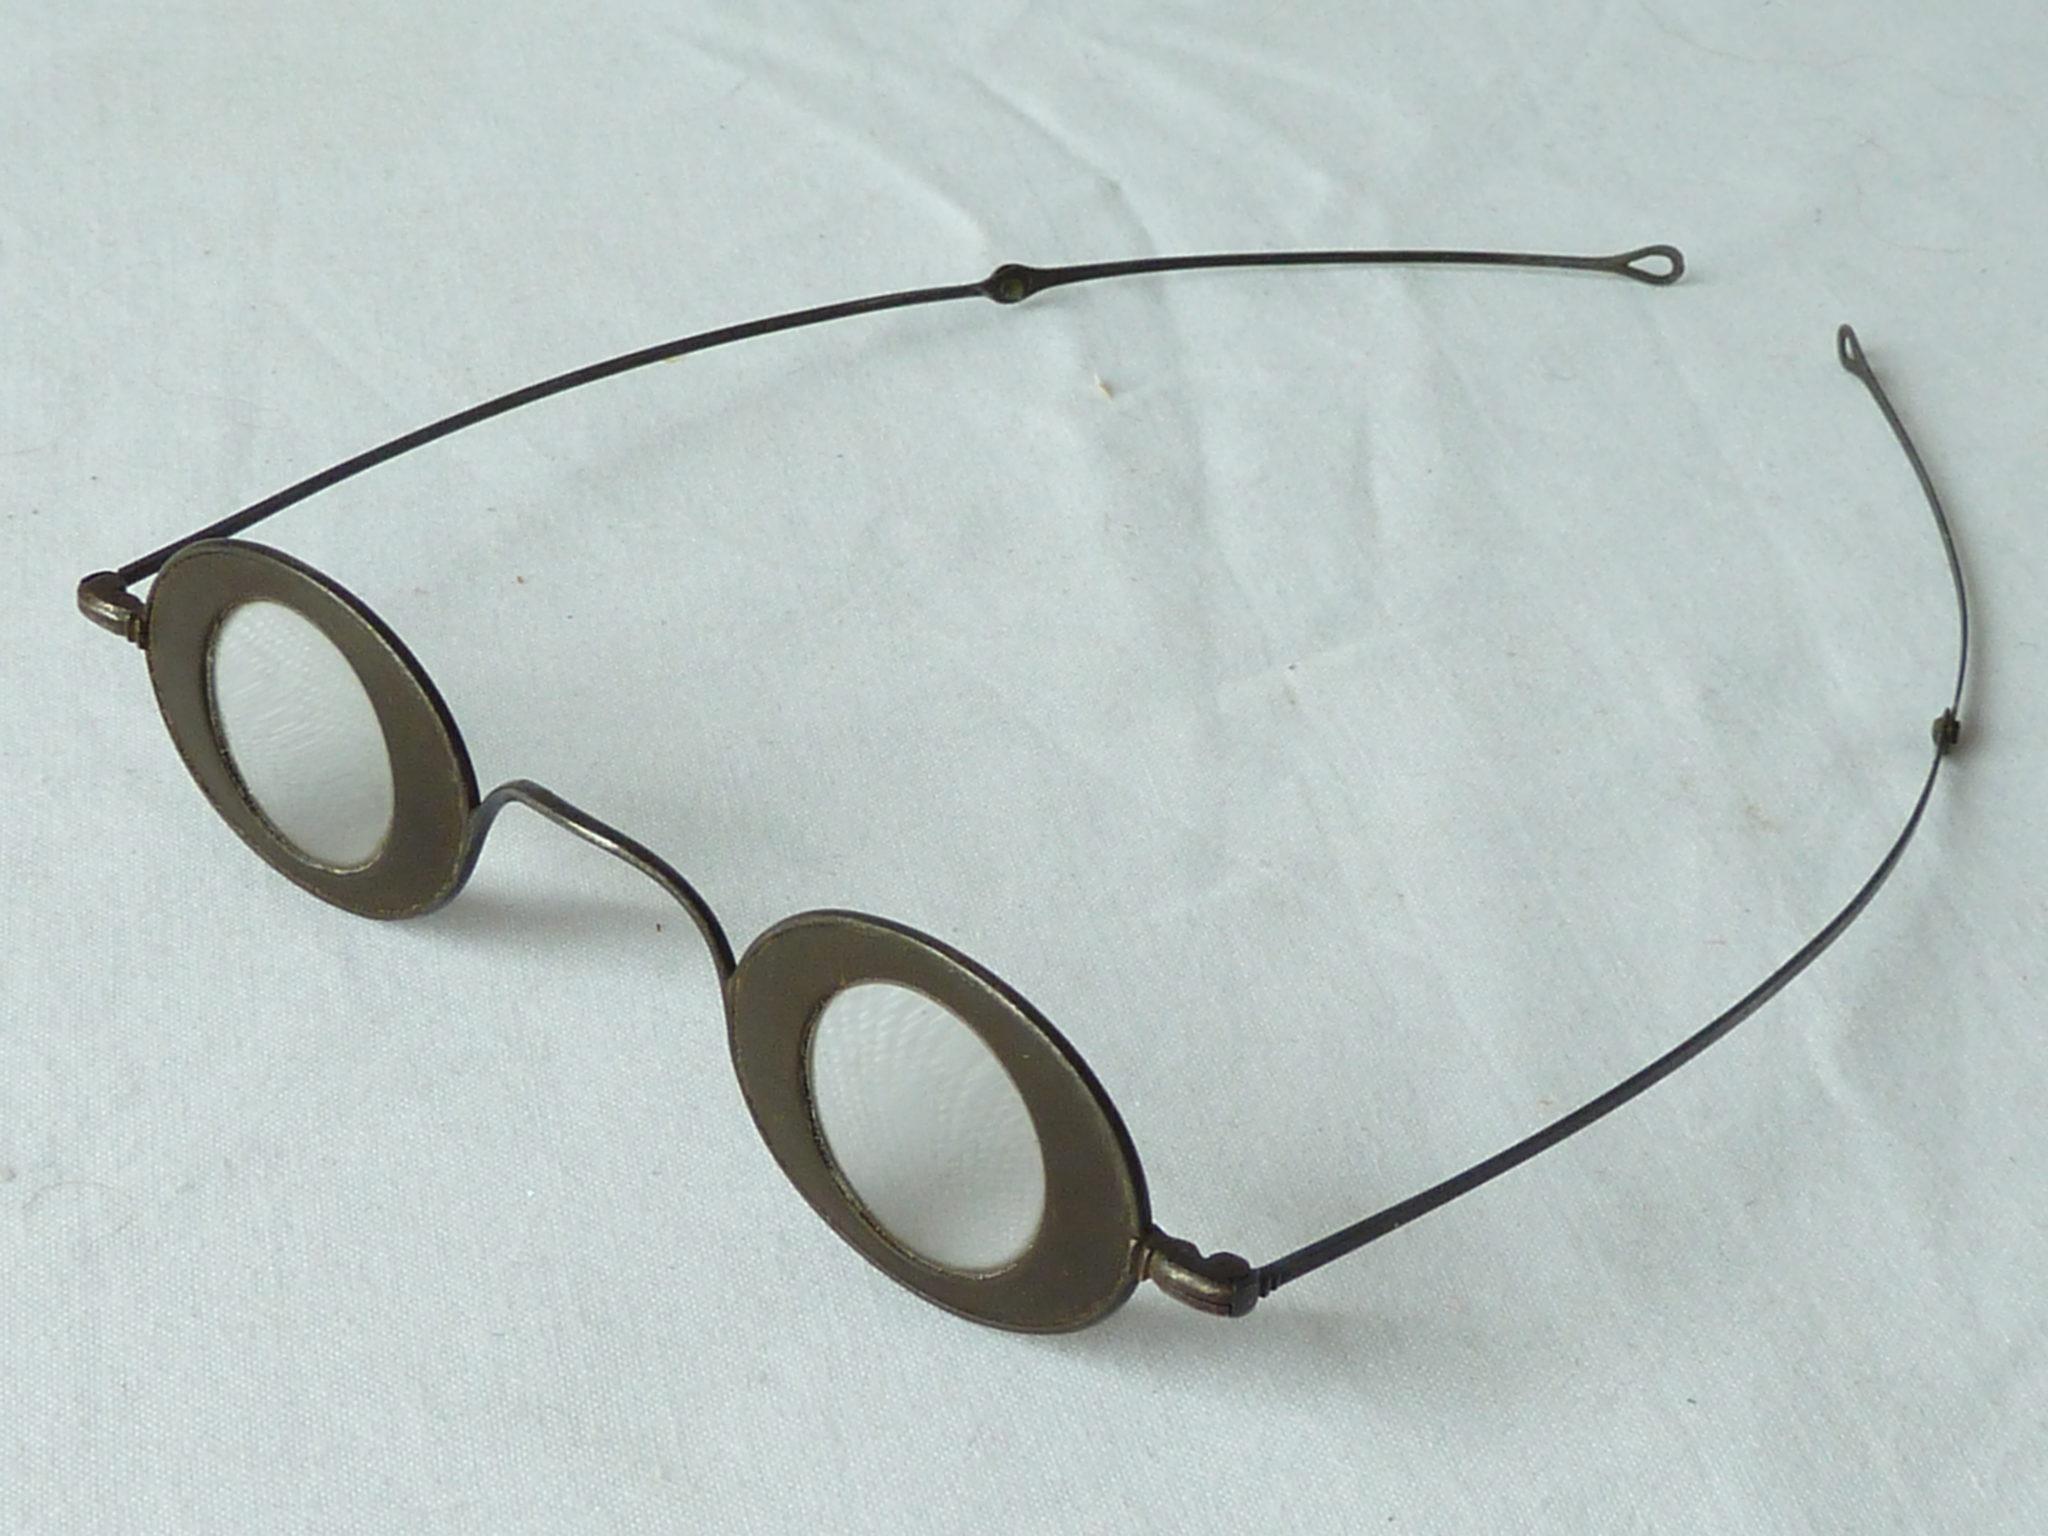 Martin's Margins Spectacles Oval Horn Blued Steel Antique